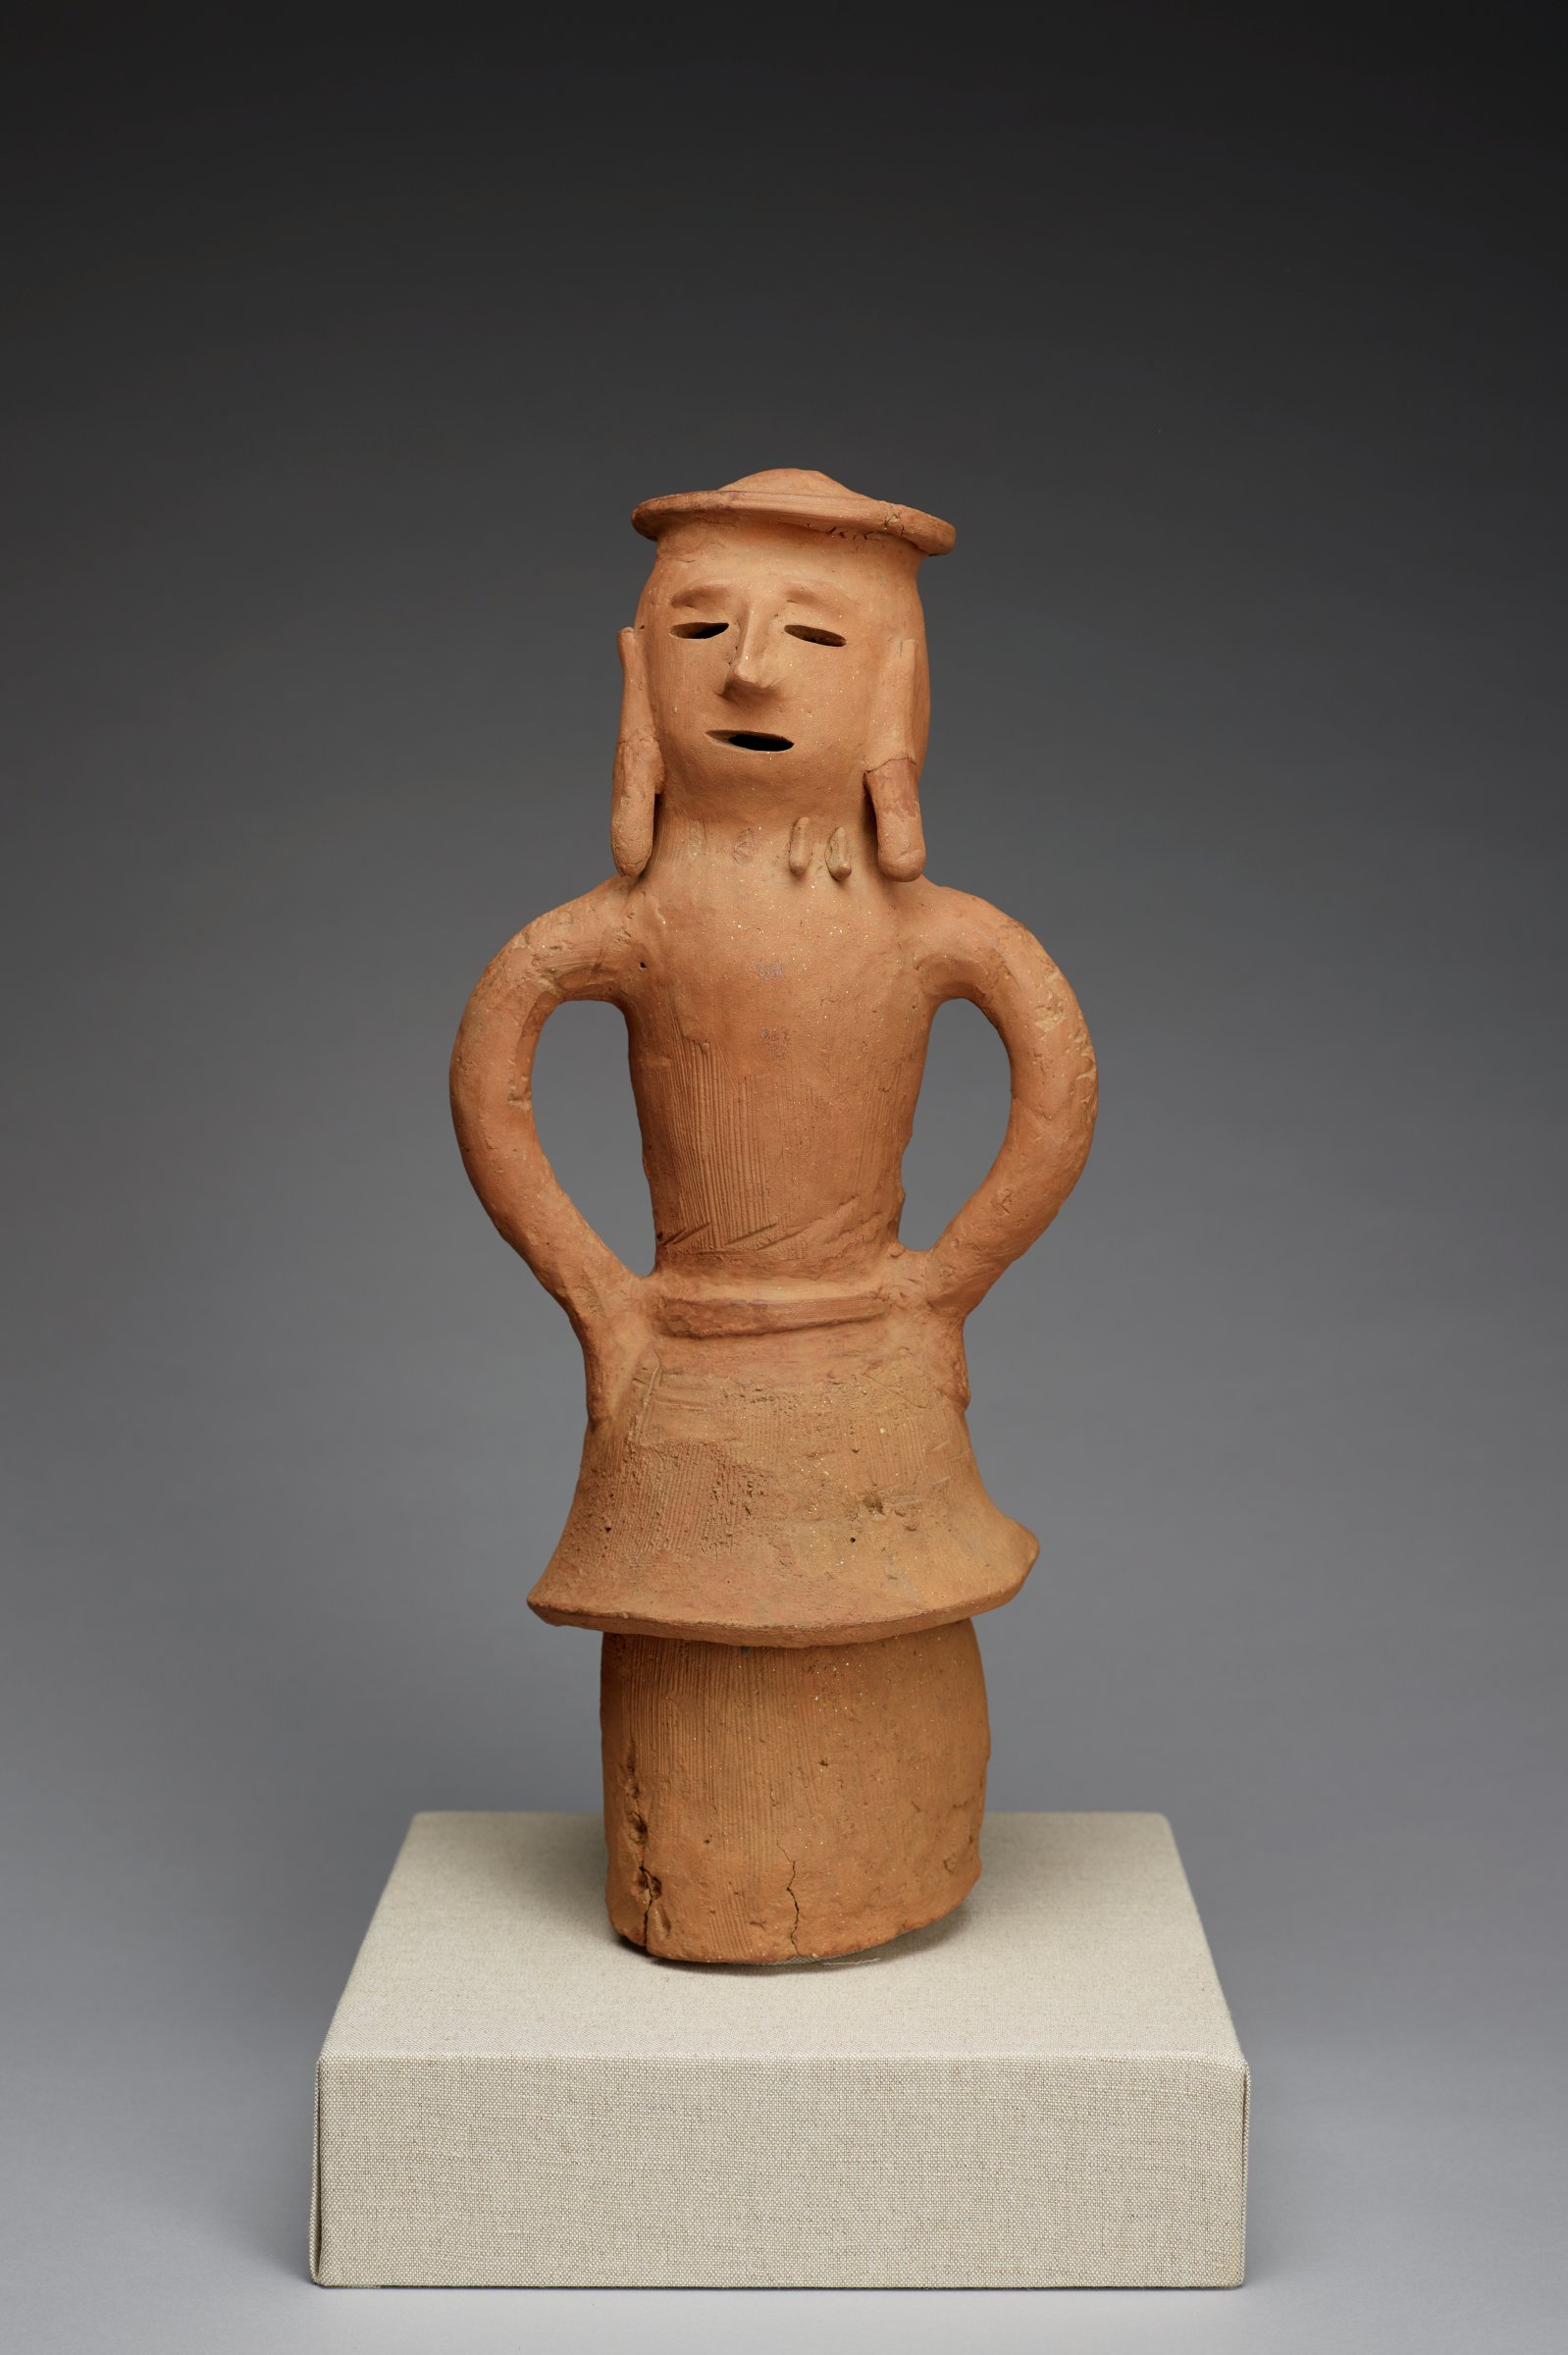 A standing earthenware Haniwa burial figure